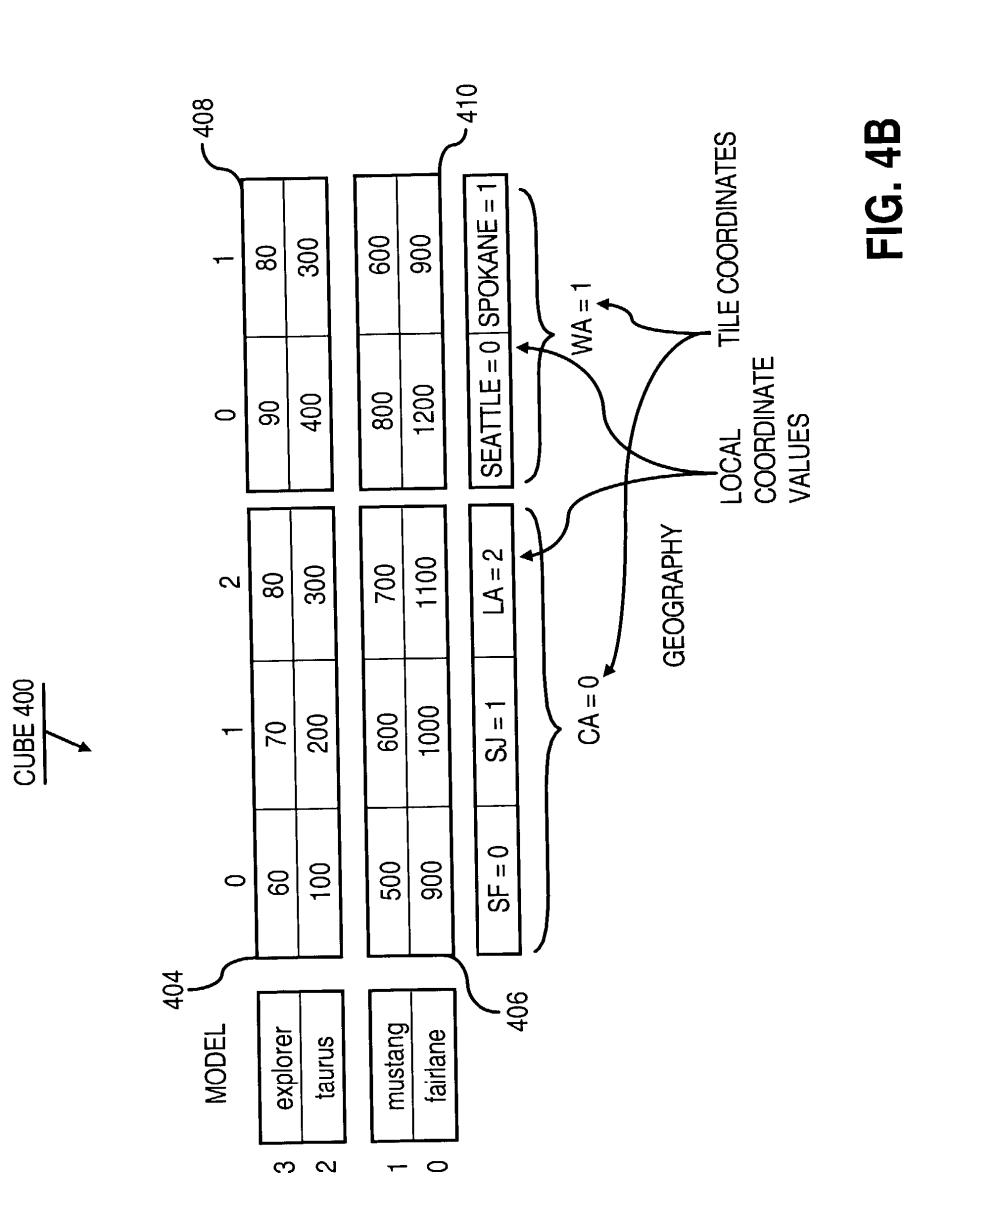 medium resolution of f 53 motorhome engine diagram